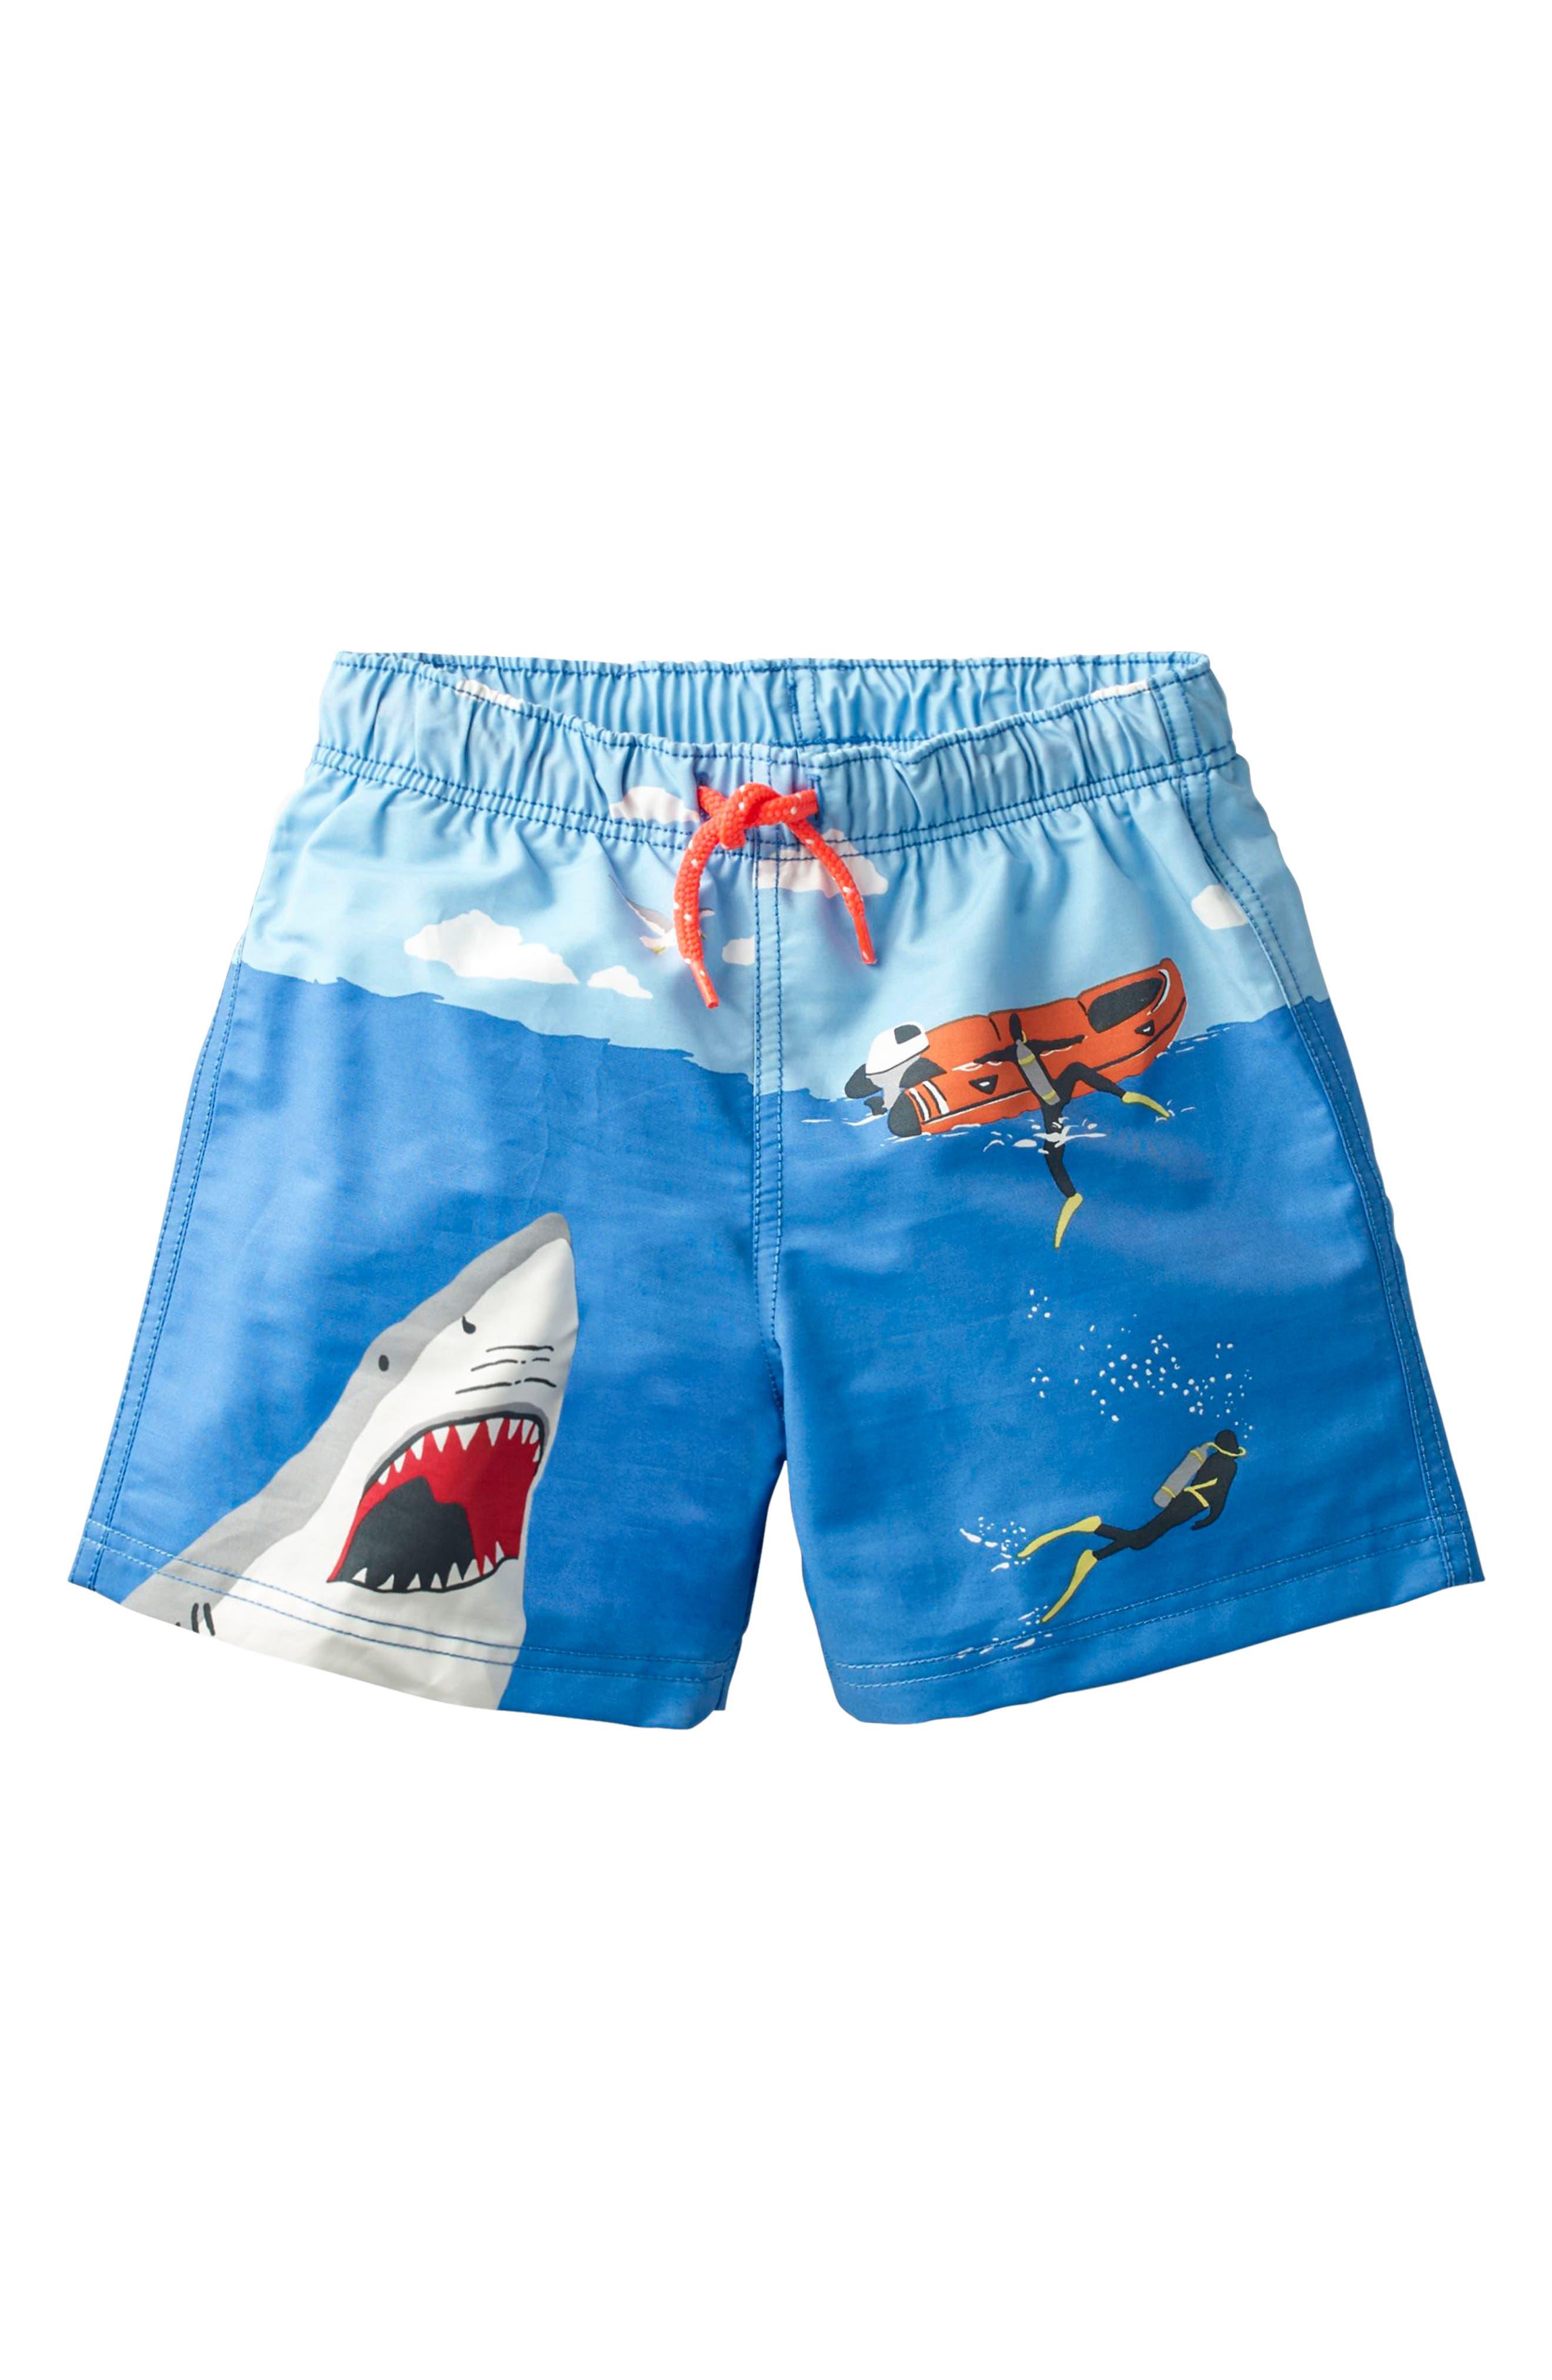 Bathers Shark Swim Trunks,                         Main,                         color, 454